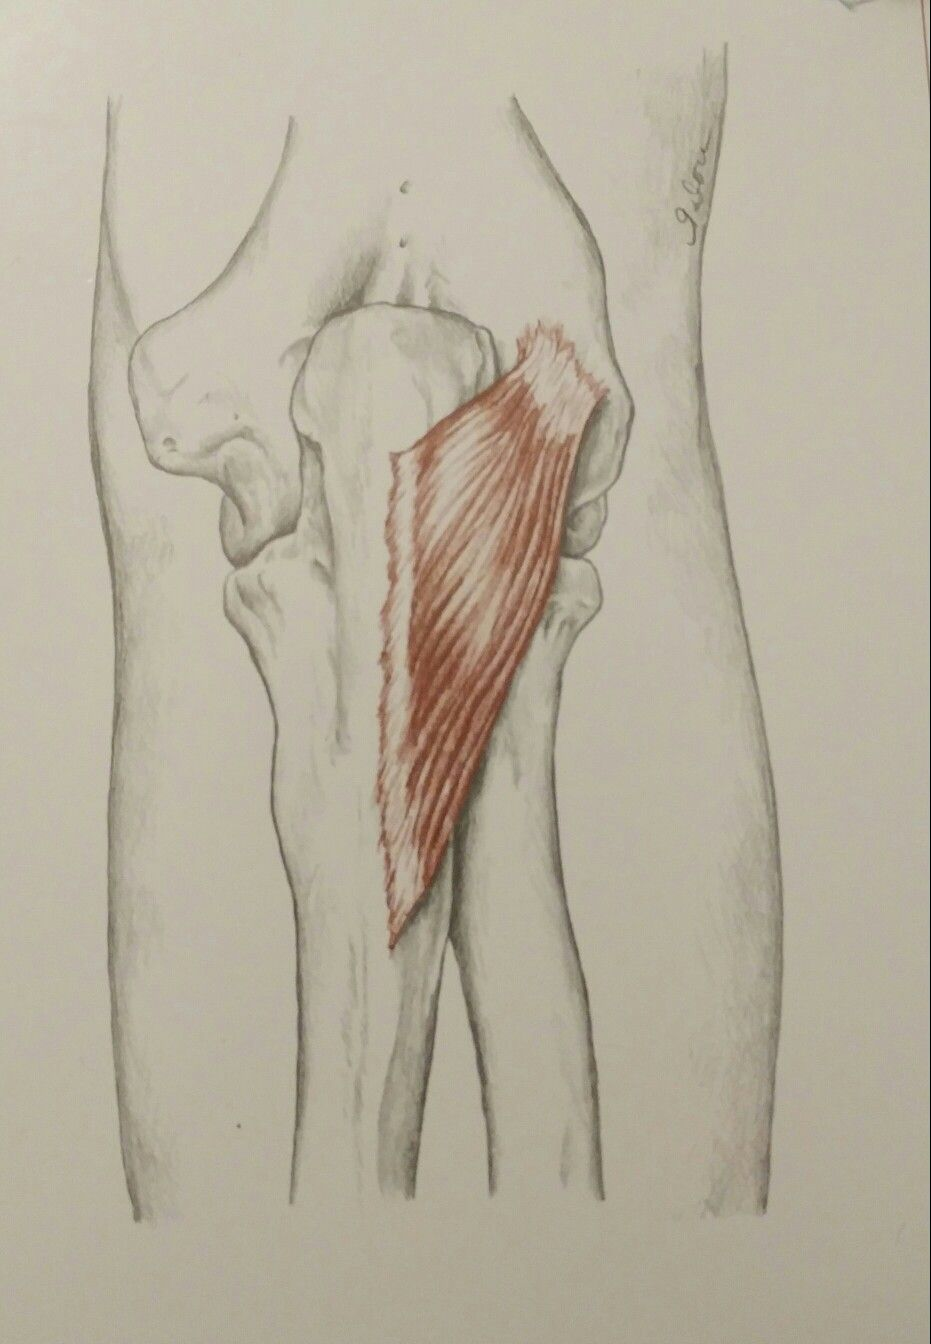 Anconeus   Anatomy - Forearm & Hand Muscles   Pinterest   Anatomy ...